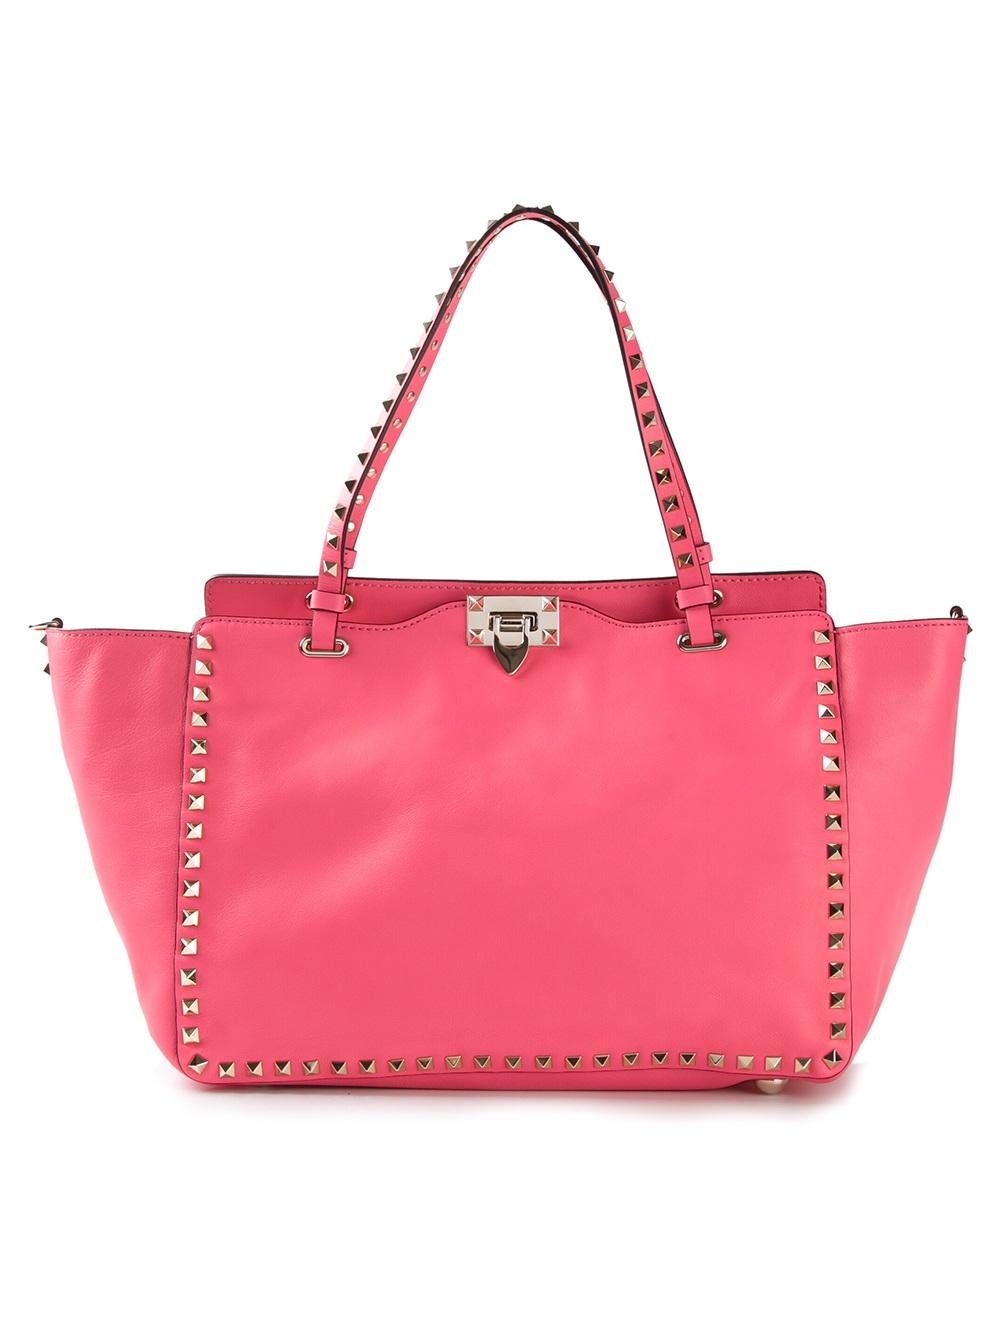 valentino rockstud tote bag in pink lyst